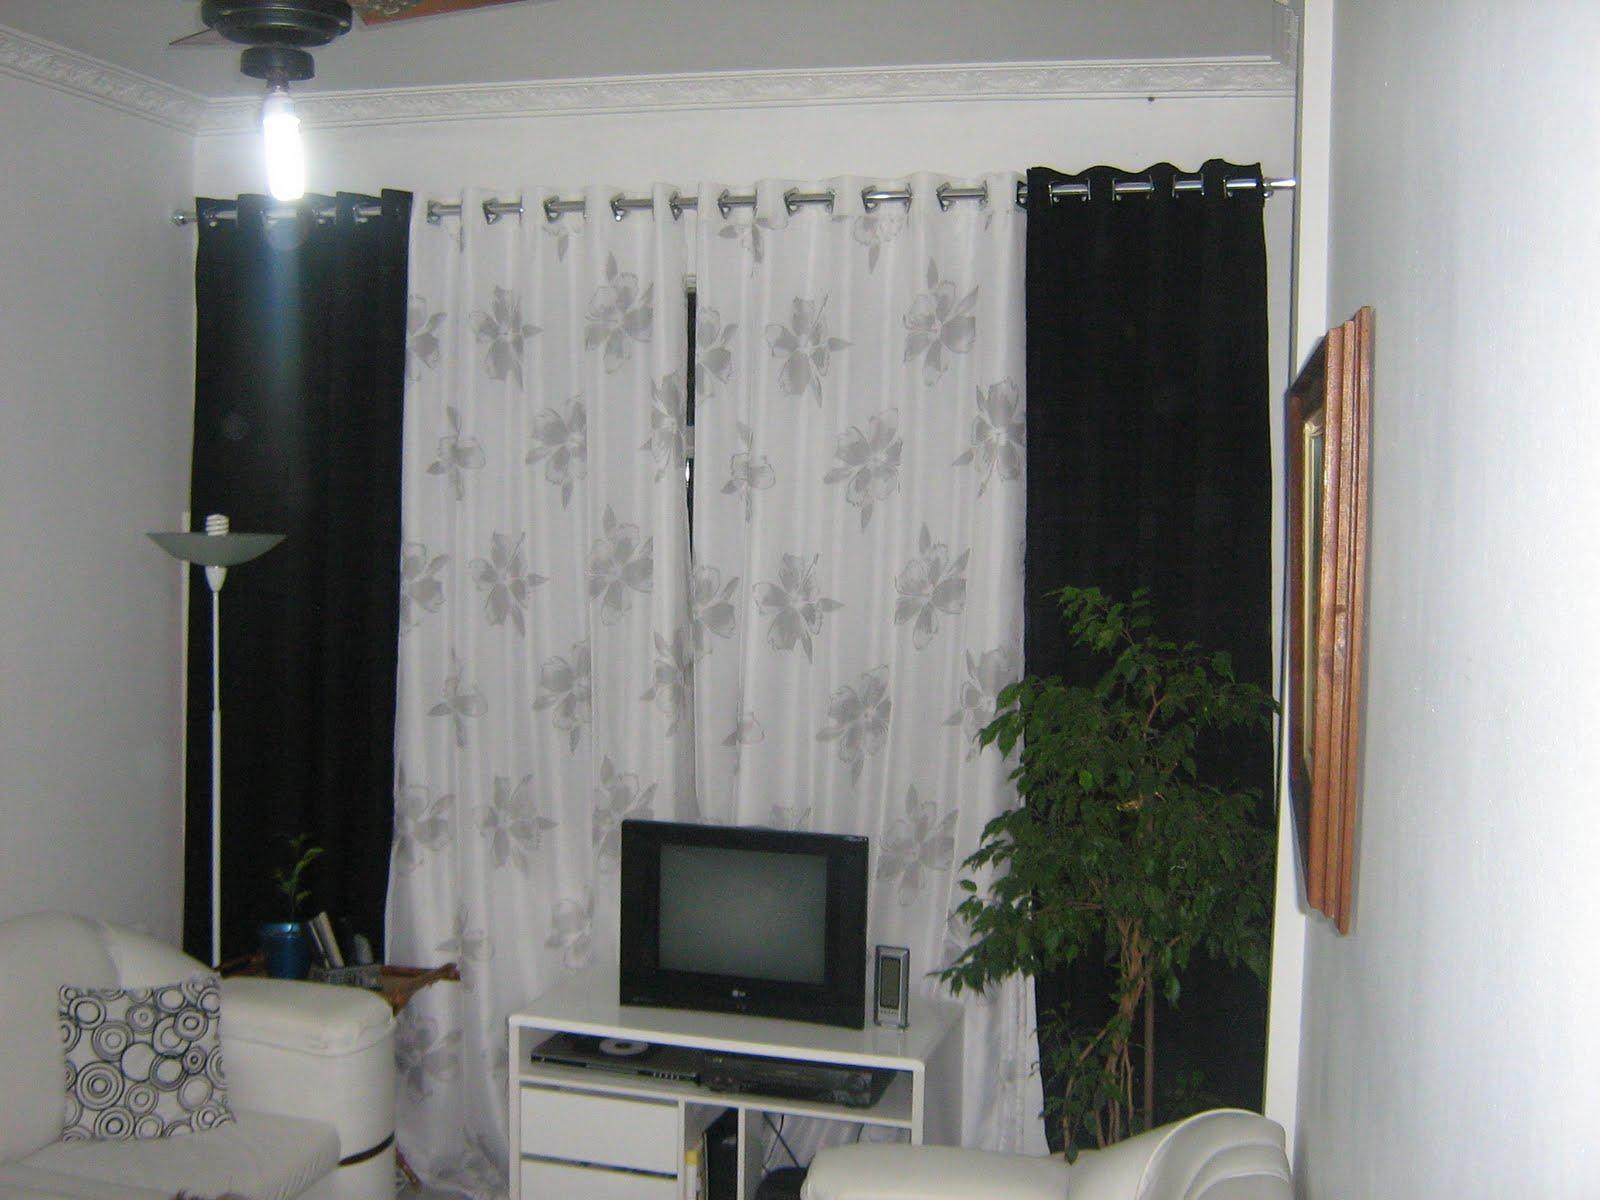 Decorao pequenas salas simples decoracao simples holidays oo for Como decorar sala